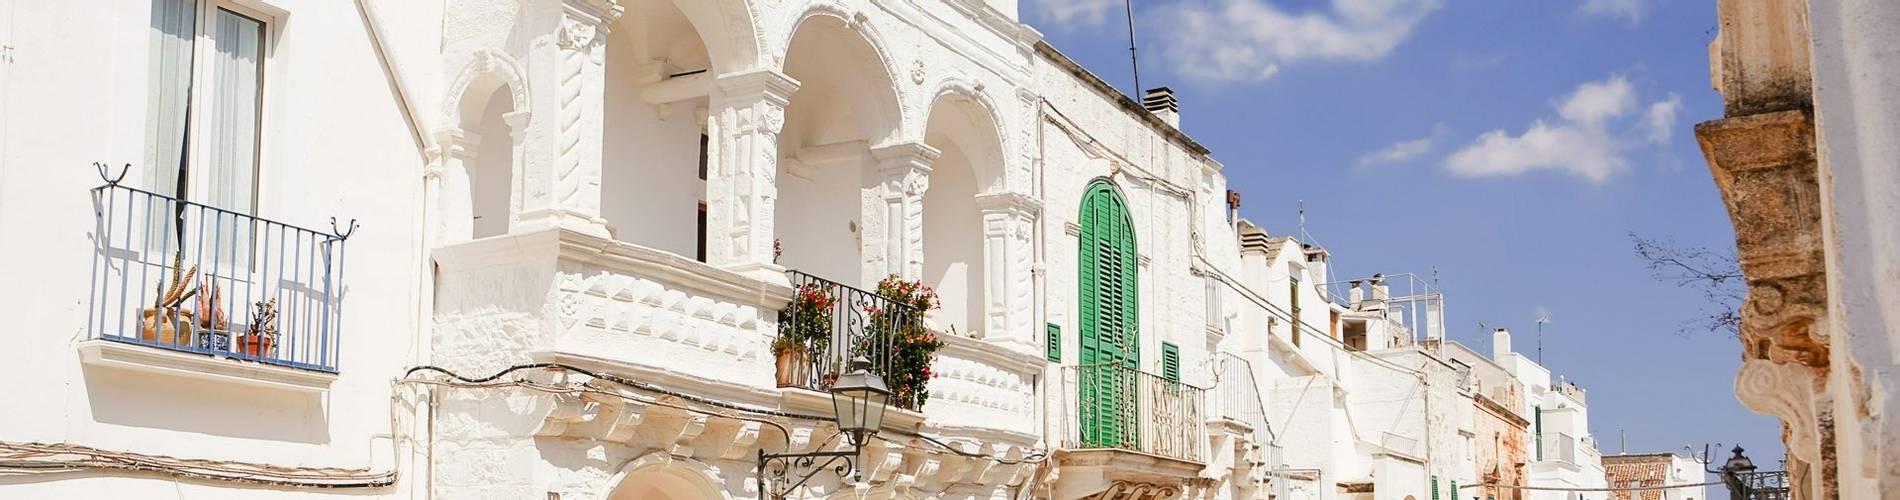 Cisternino, Puglia.jpg